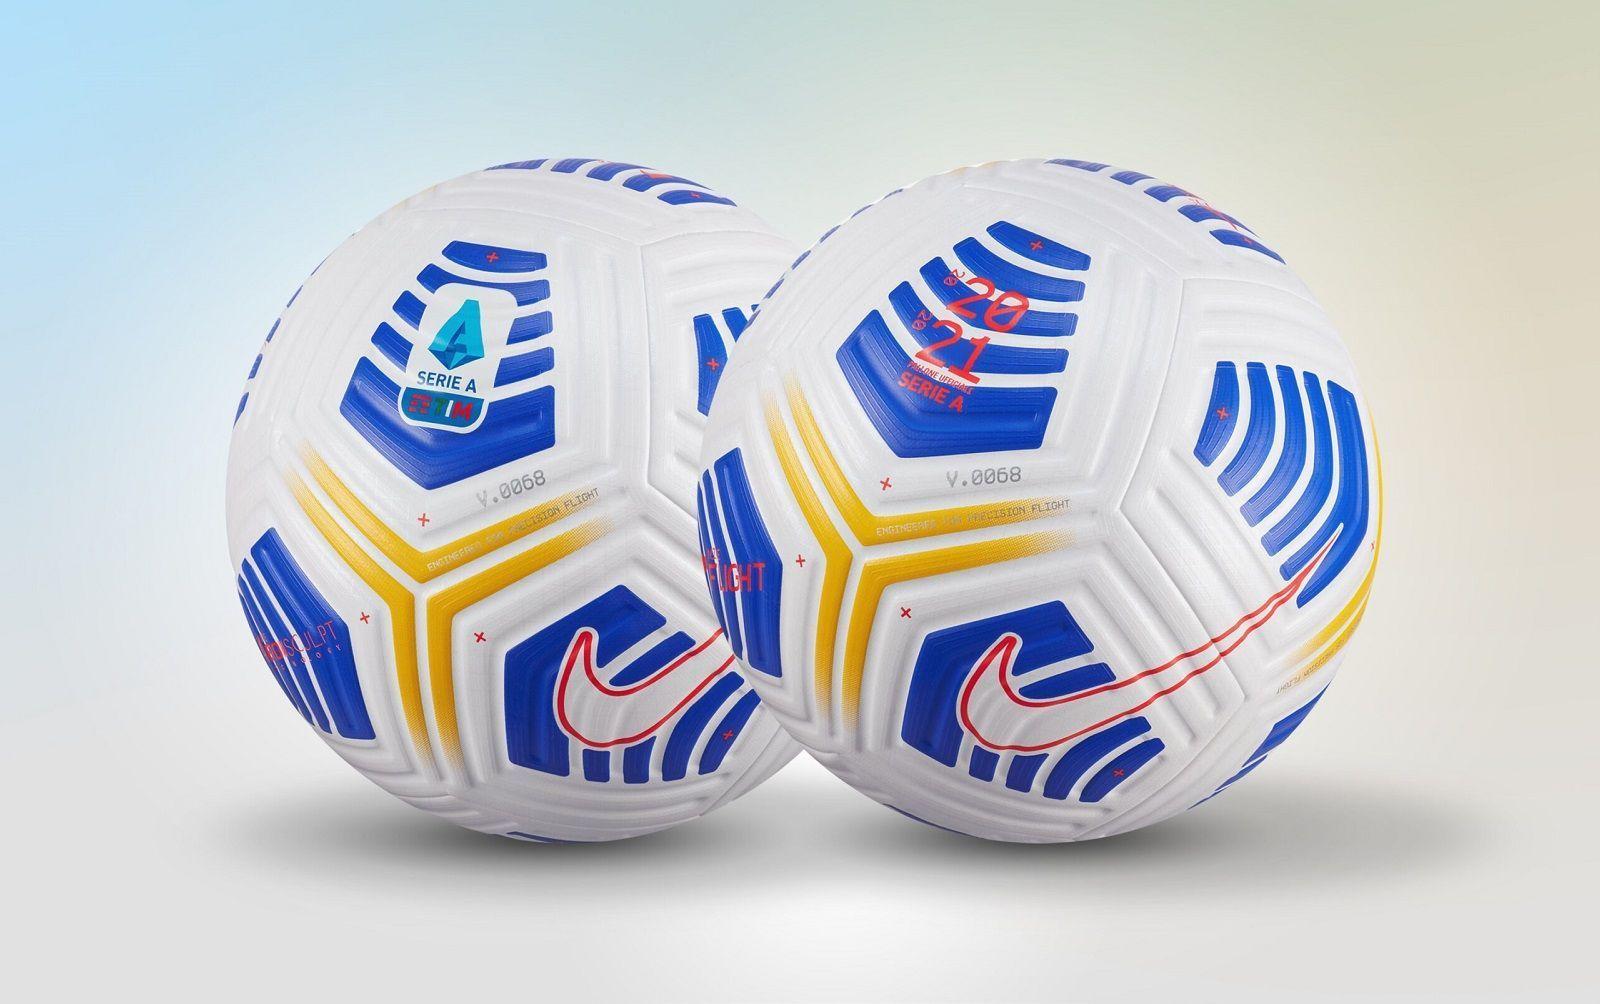 Nike Serie A 2020 2021 Ball Superfanatix Com In 2020 Soccer Pink Football Soccer Ball